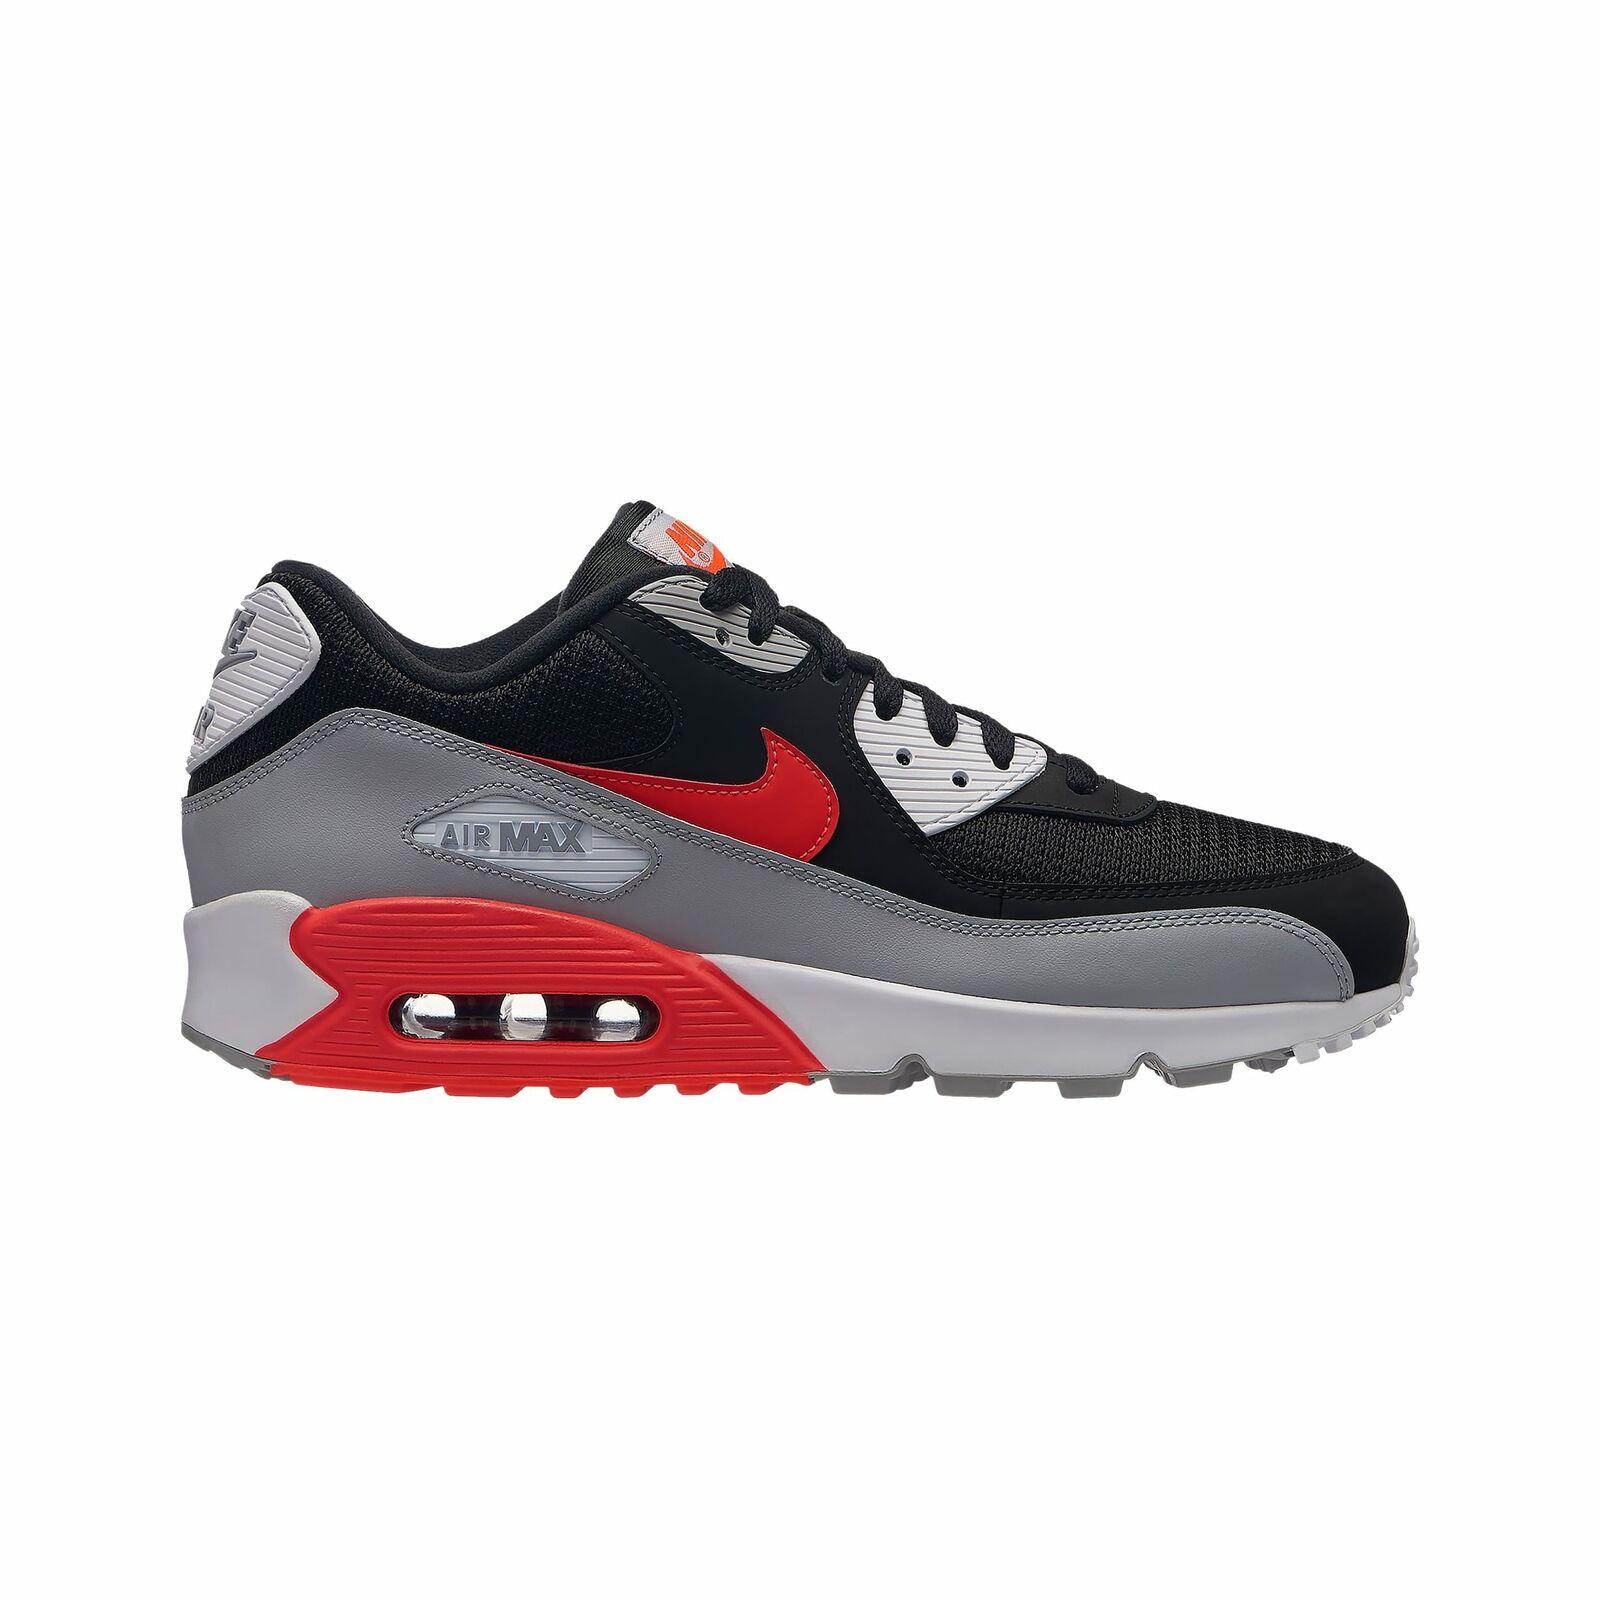 Nike Air Max 90 - Men's Wolf Grey Bright Crimson Black White J1285012